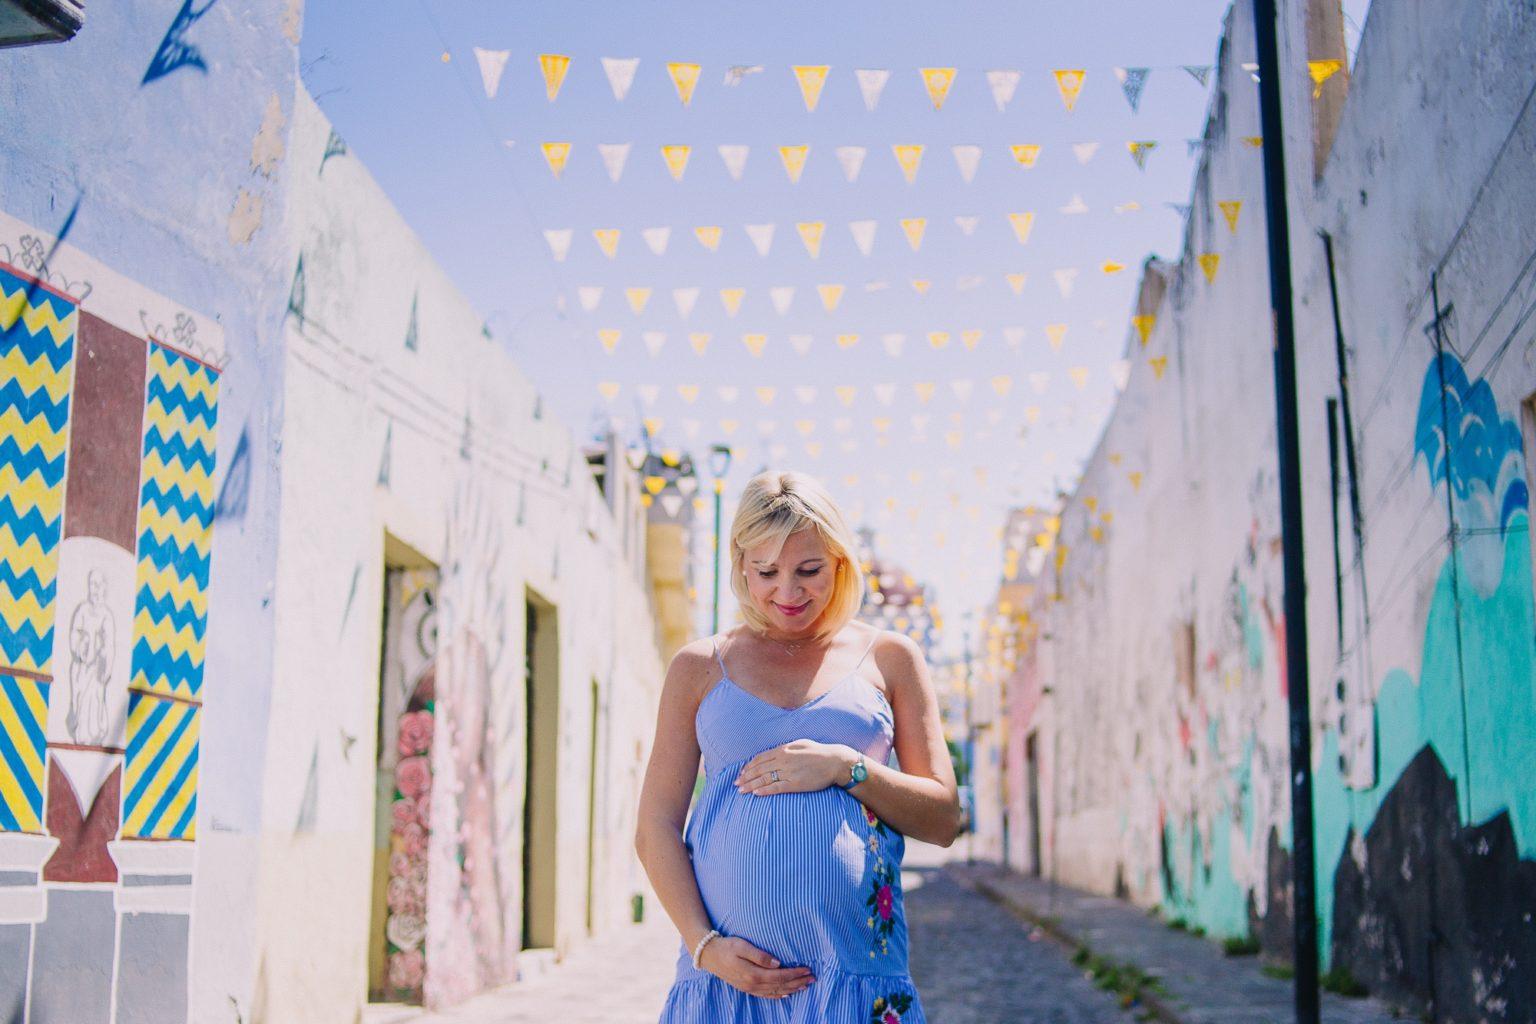 Schwangerschaft, Mexiko, Schwangerschaftsvorsorge,